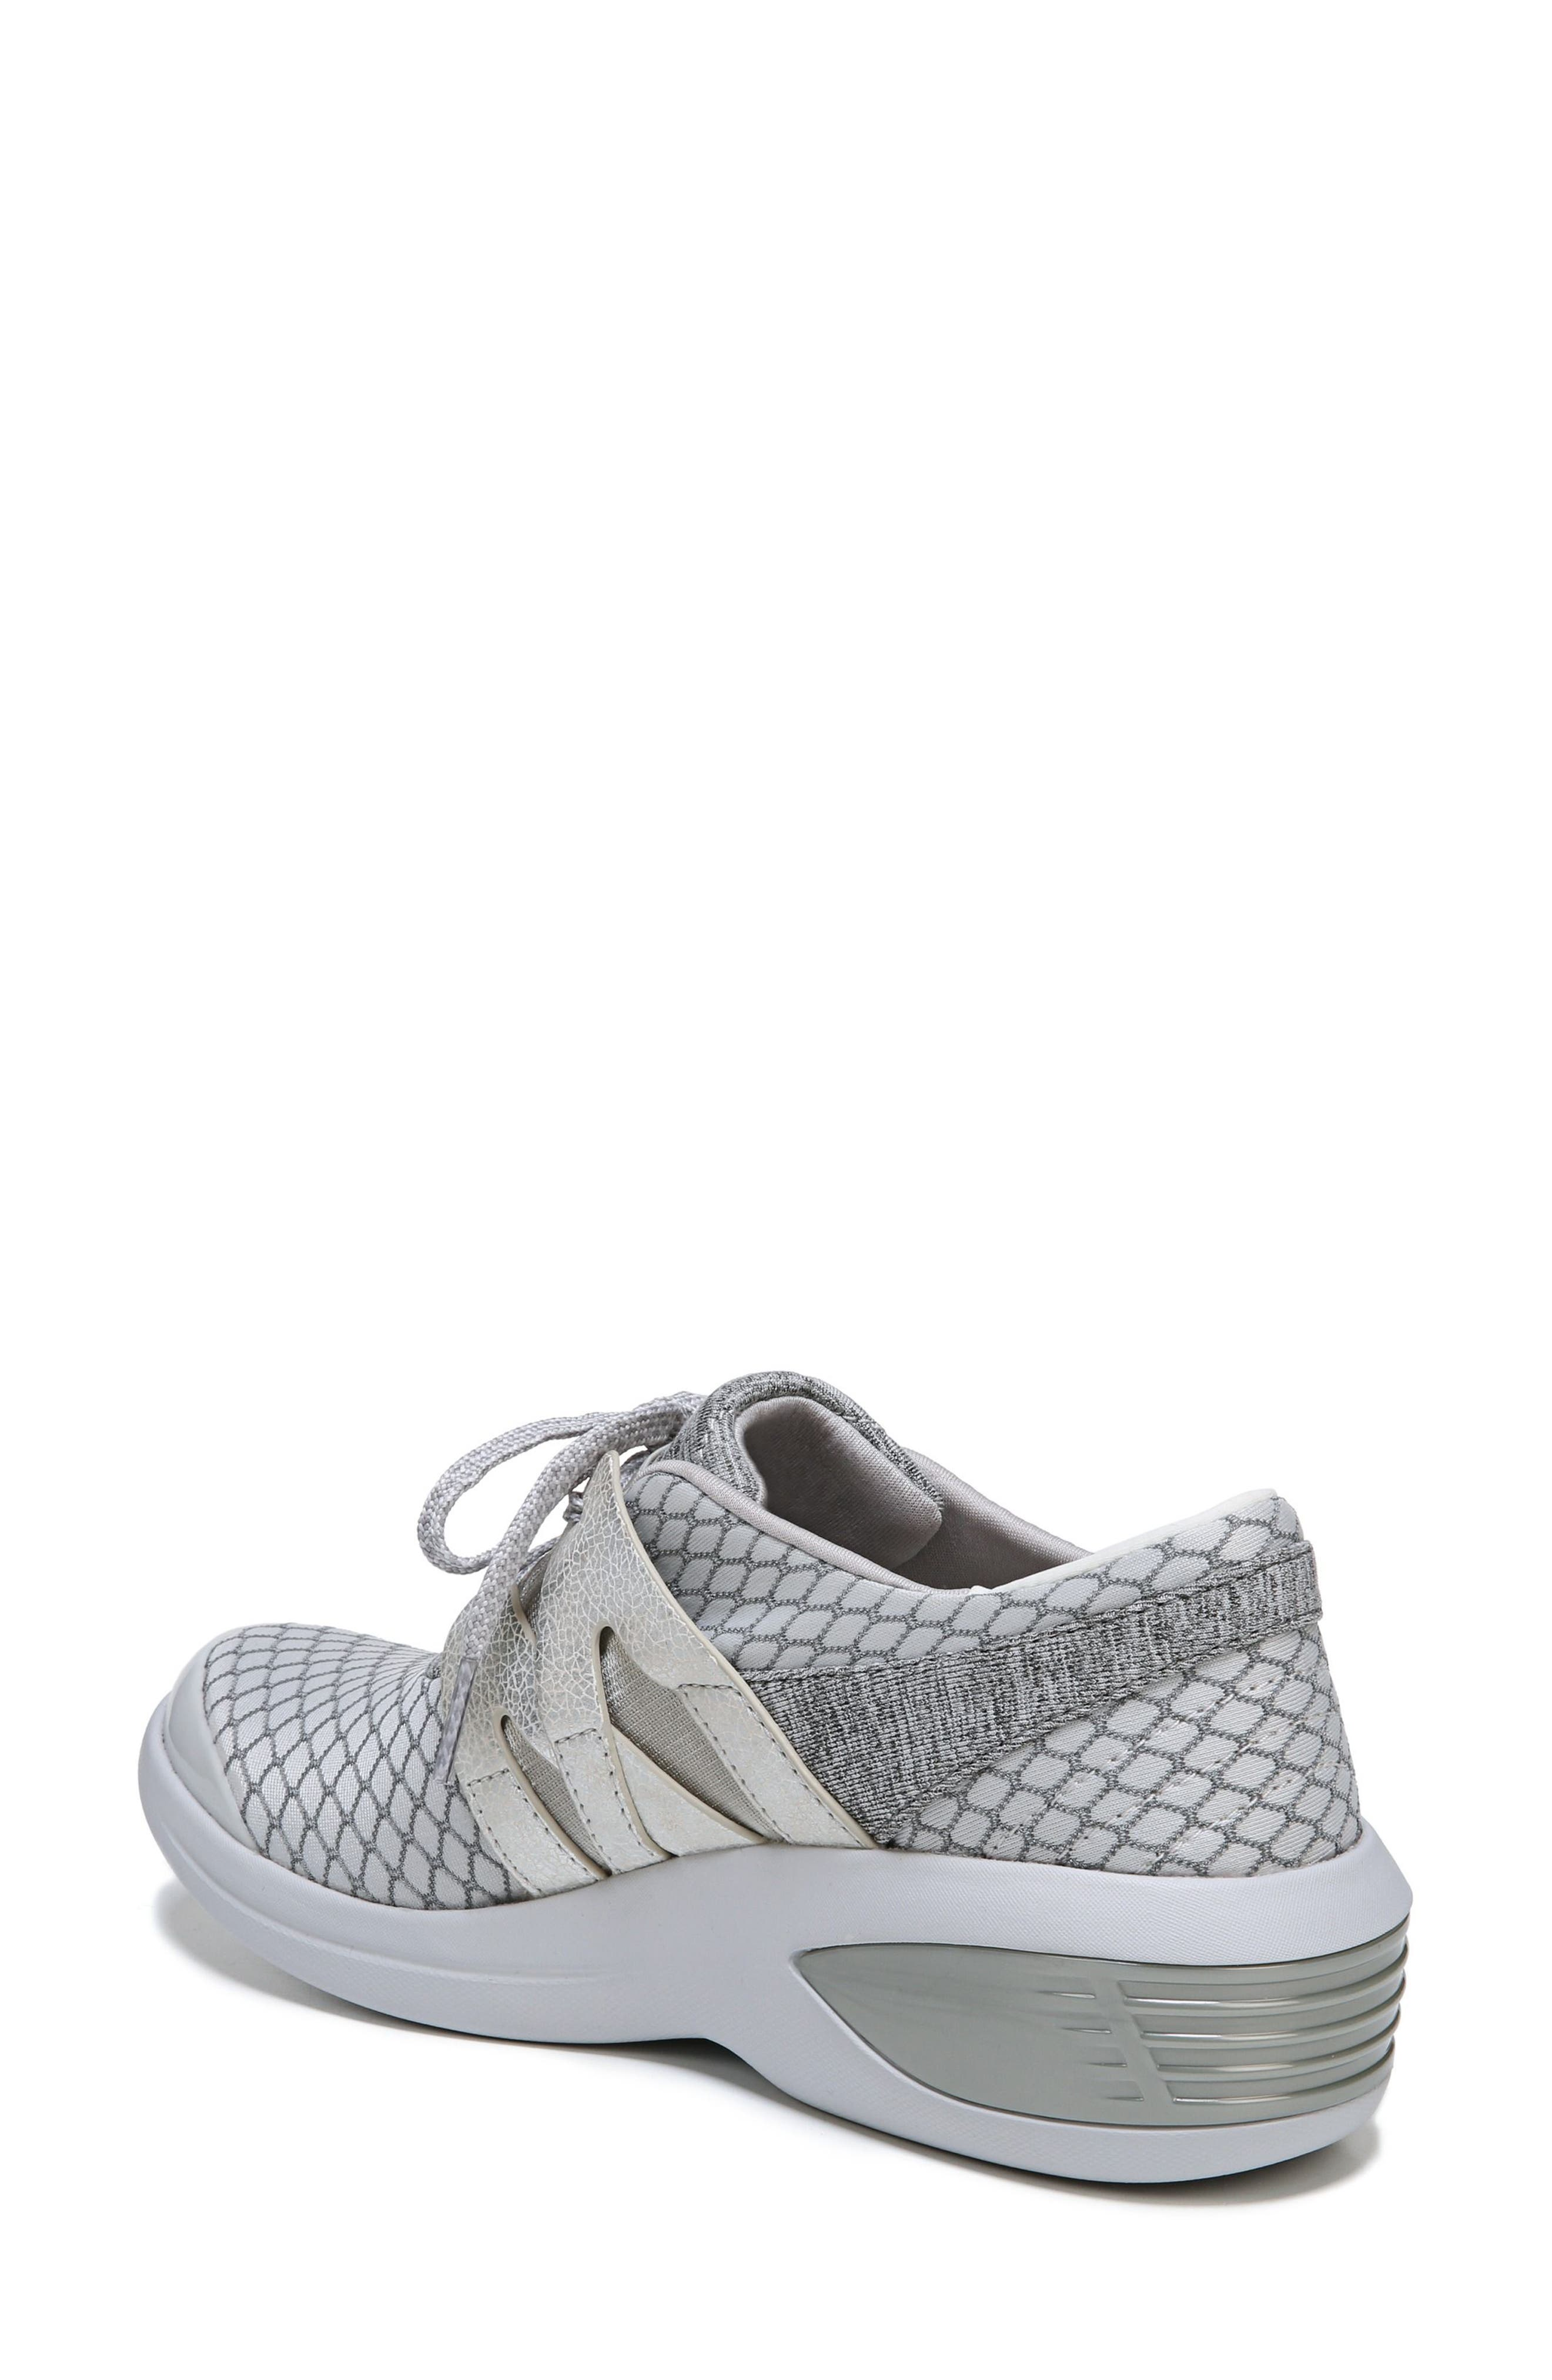 Flicker Sneaker,                             Alternate thumbnail 2, color,                             Grey Fabric